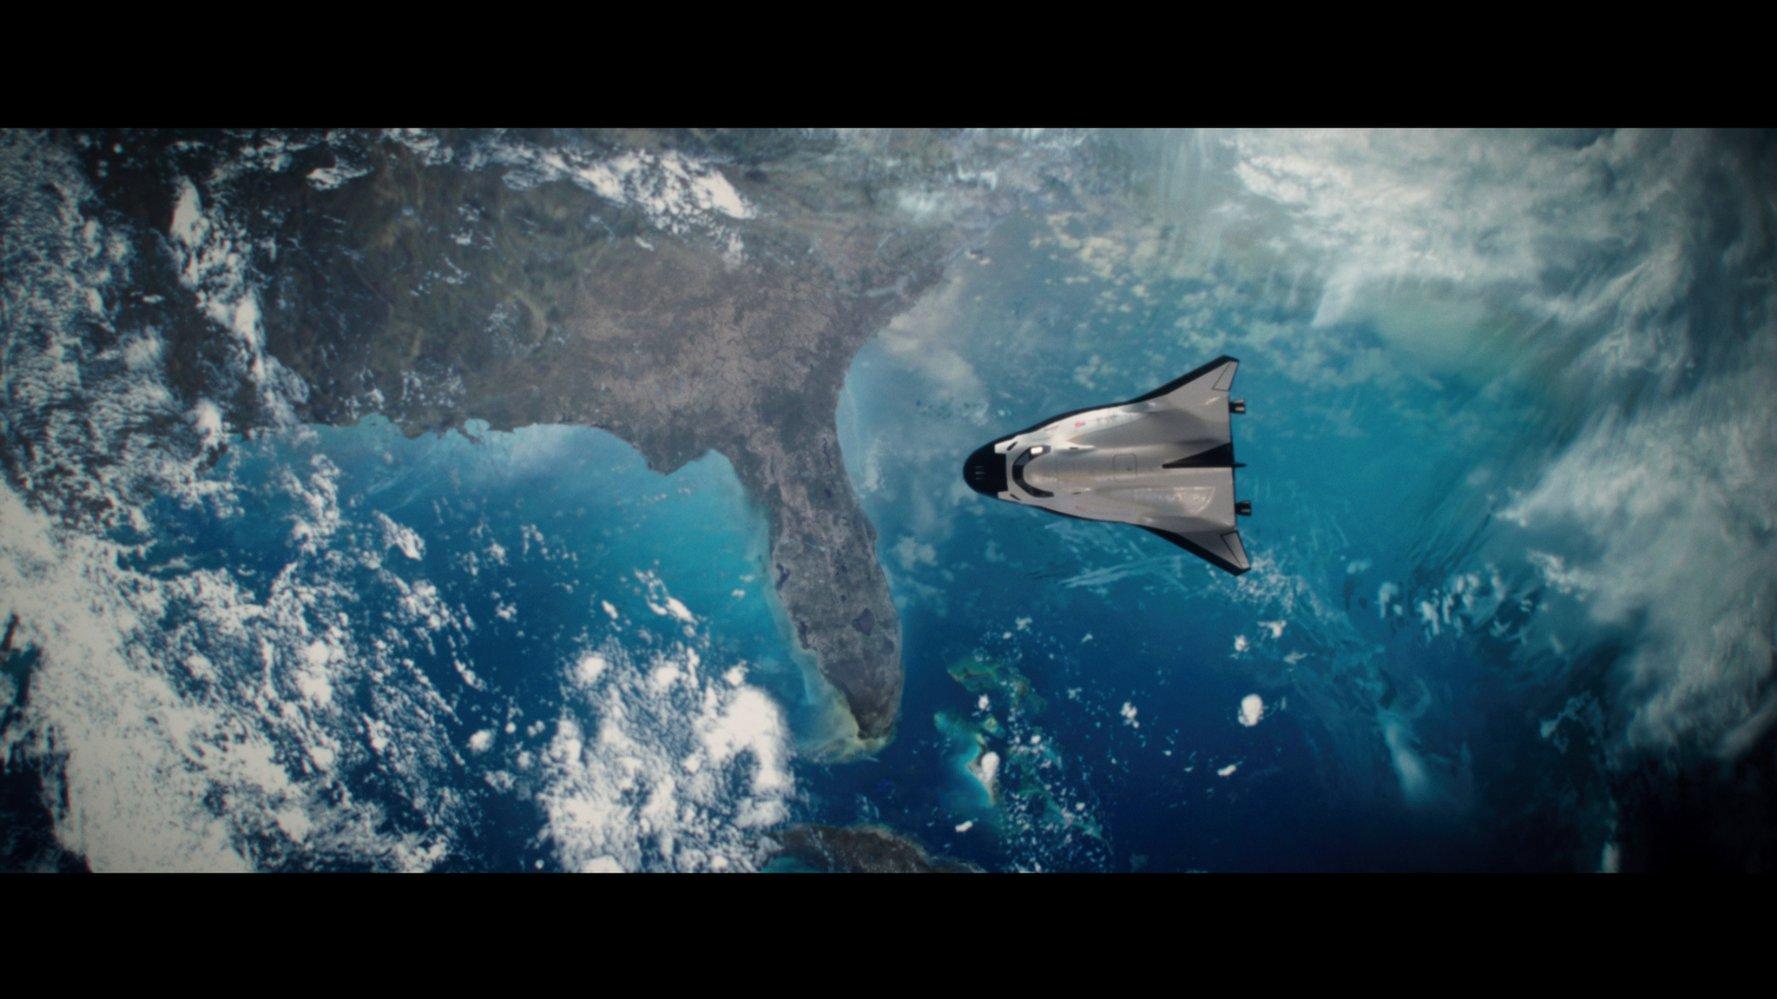 Vue de la Terre. Source IMDB